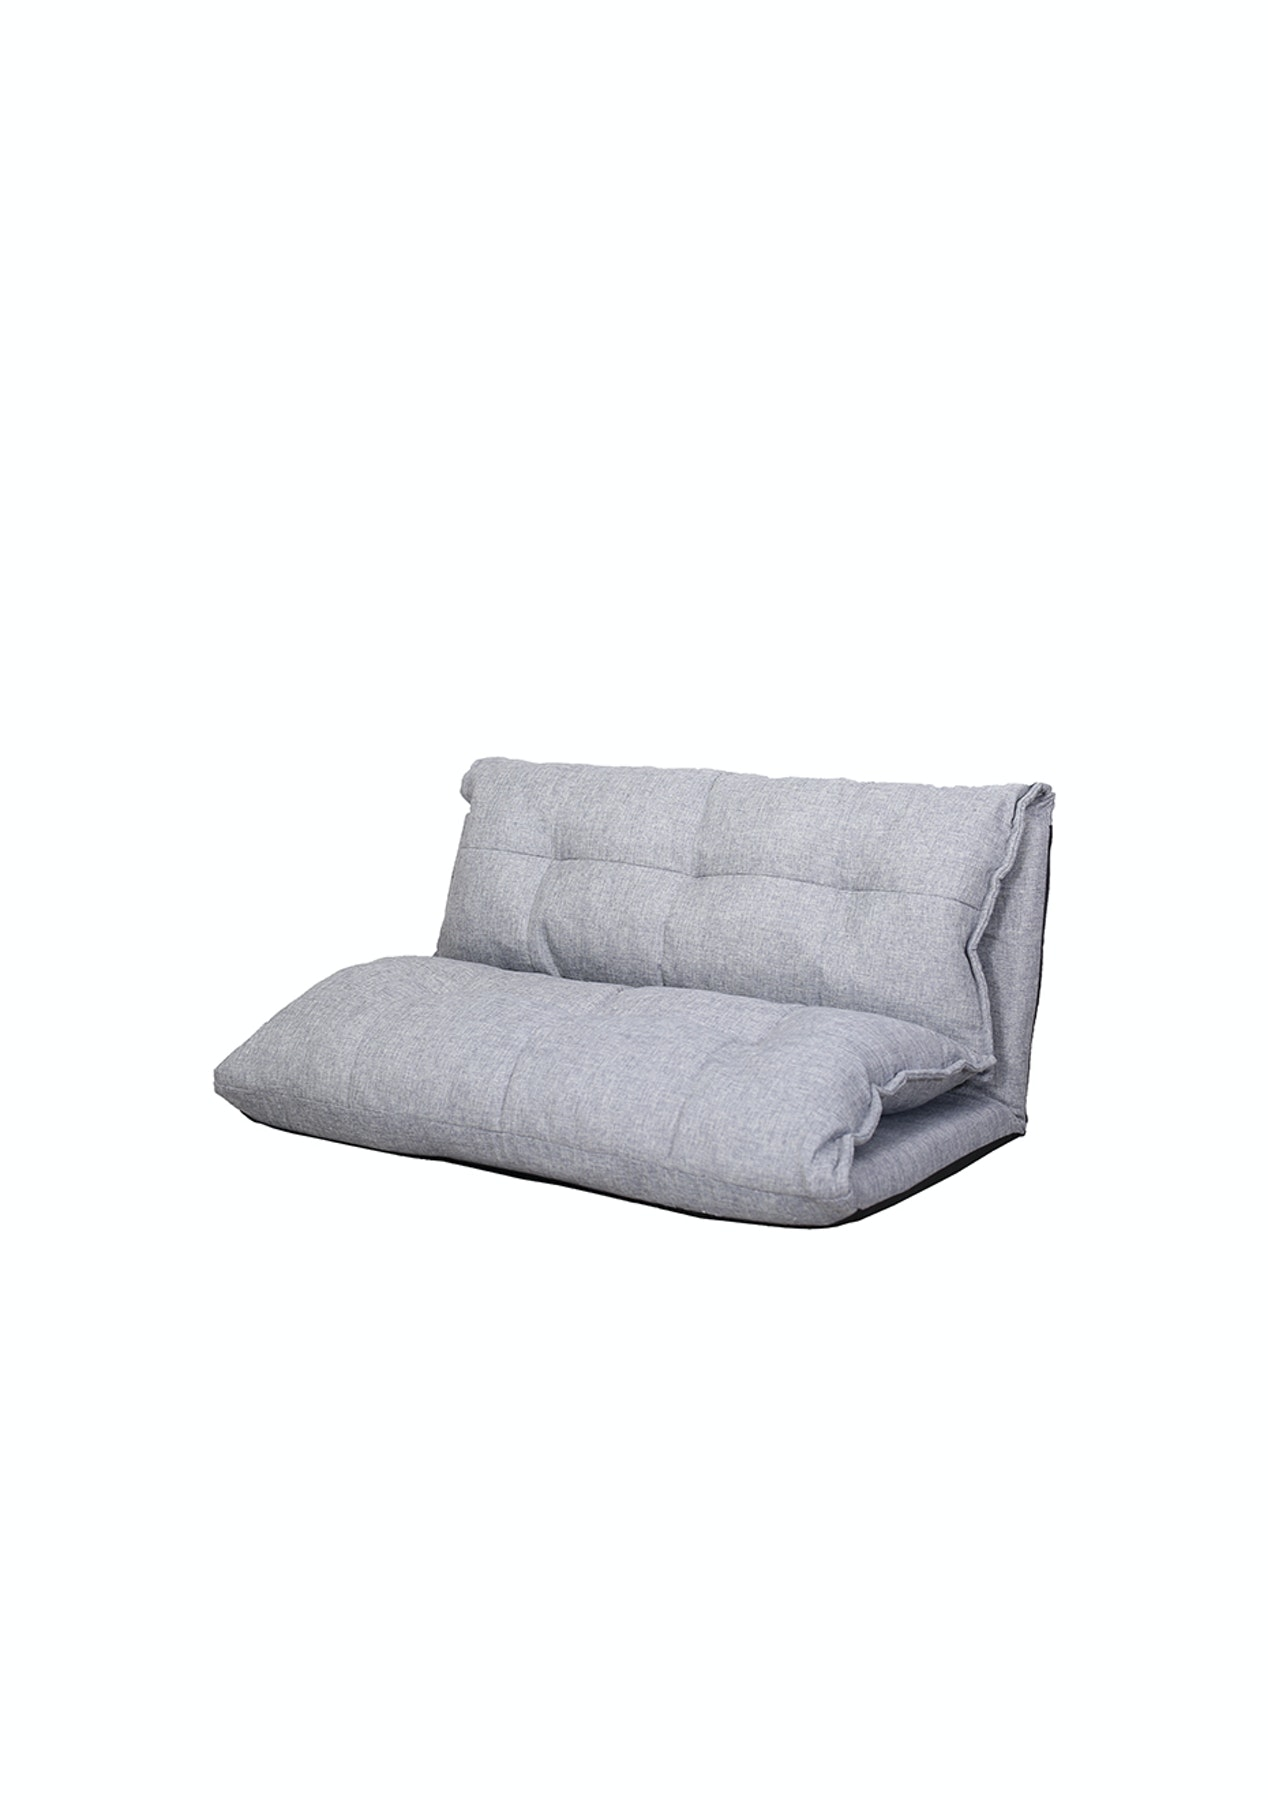 Pleasant Double Folding Sofa Lounge Chair Grey Cjindustries Chair Design For Home Cjindustriesco